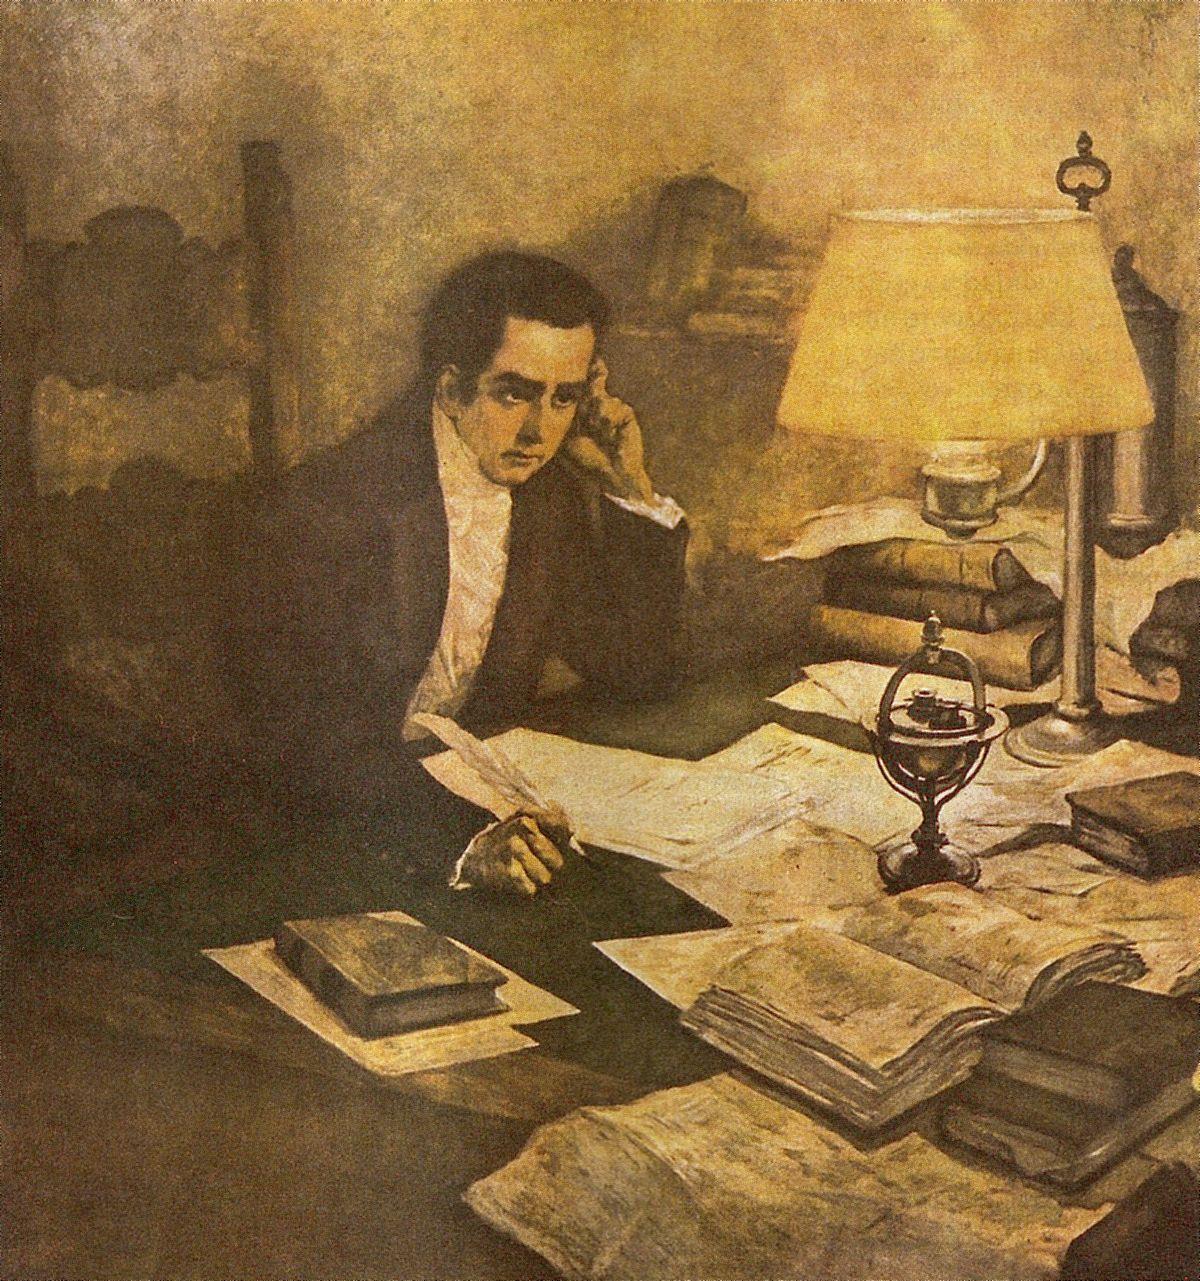 Mariano Moreno - Wikipedia, la enciclopedia libre